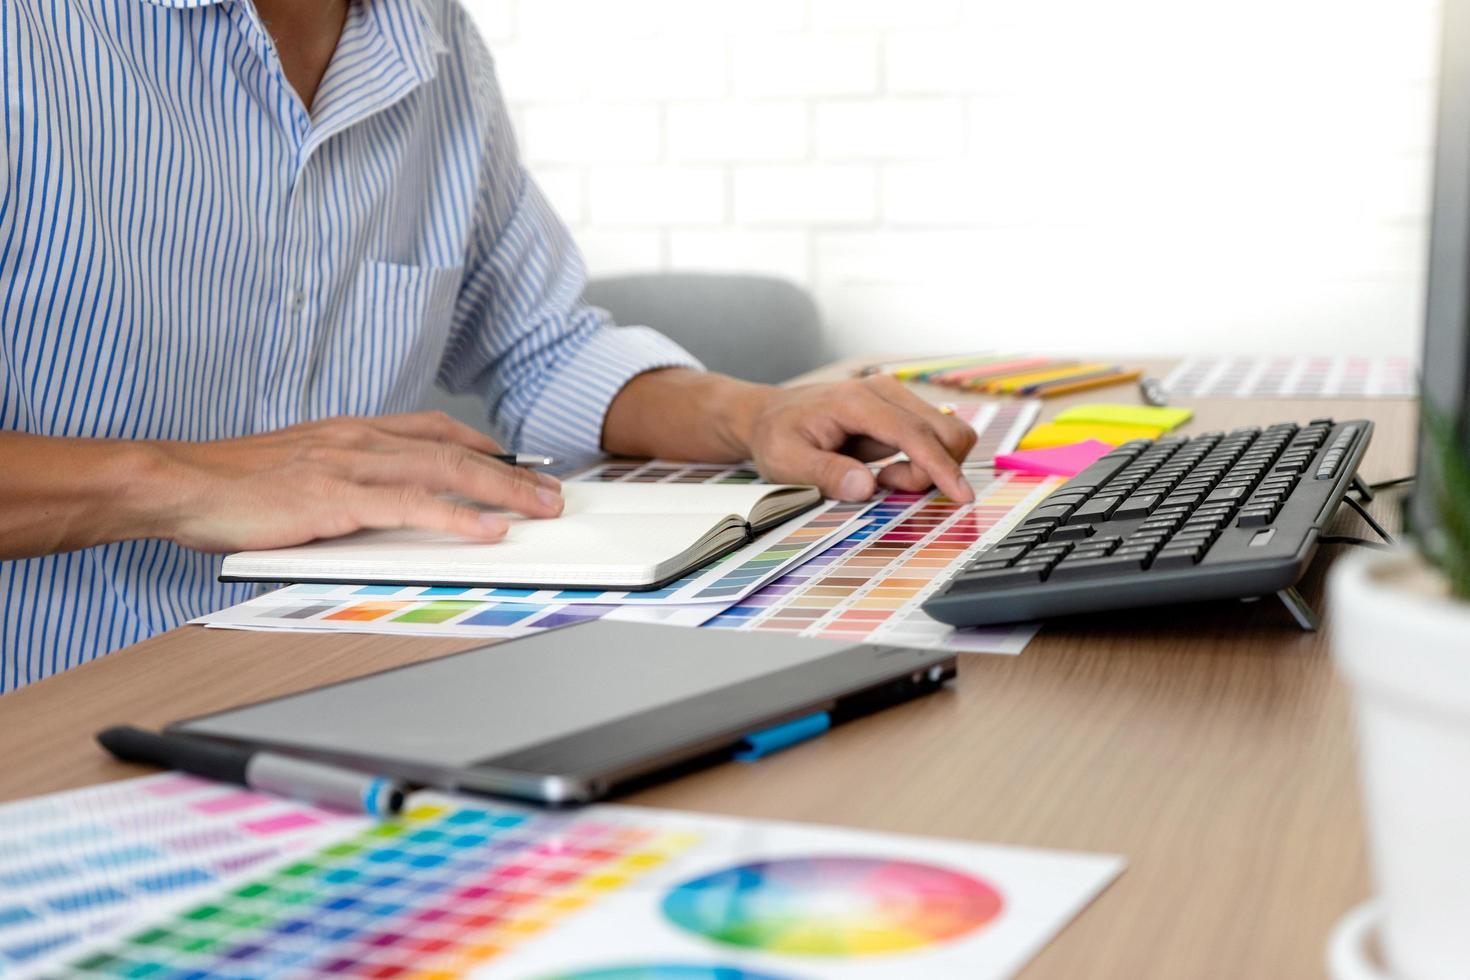 Graphic designer at work photo